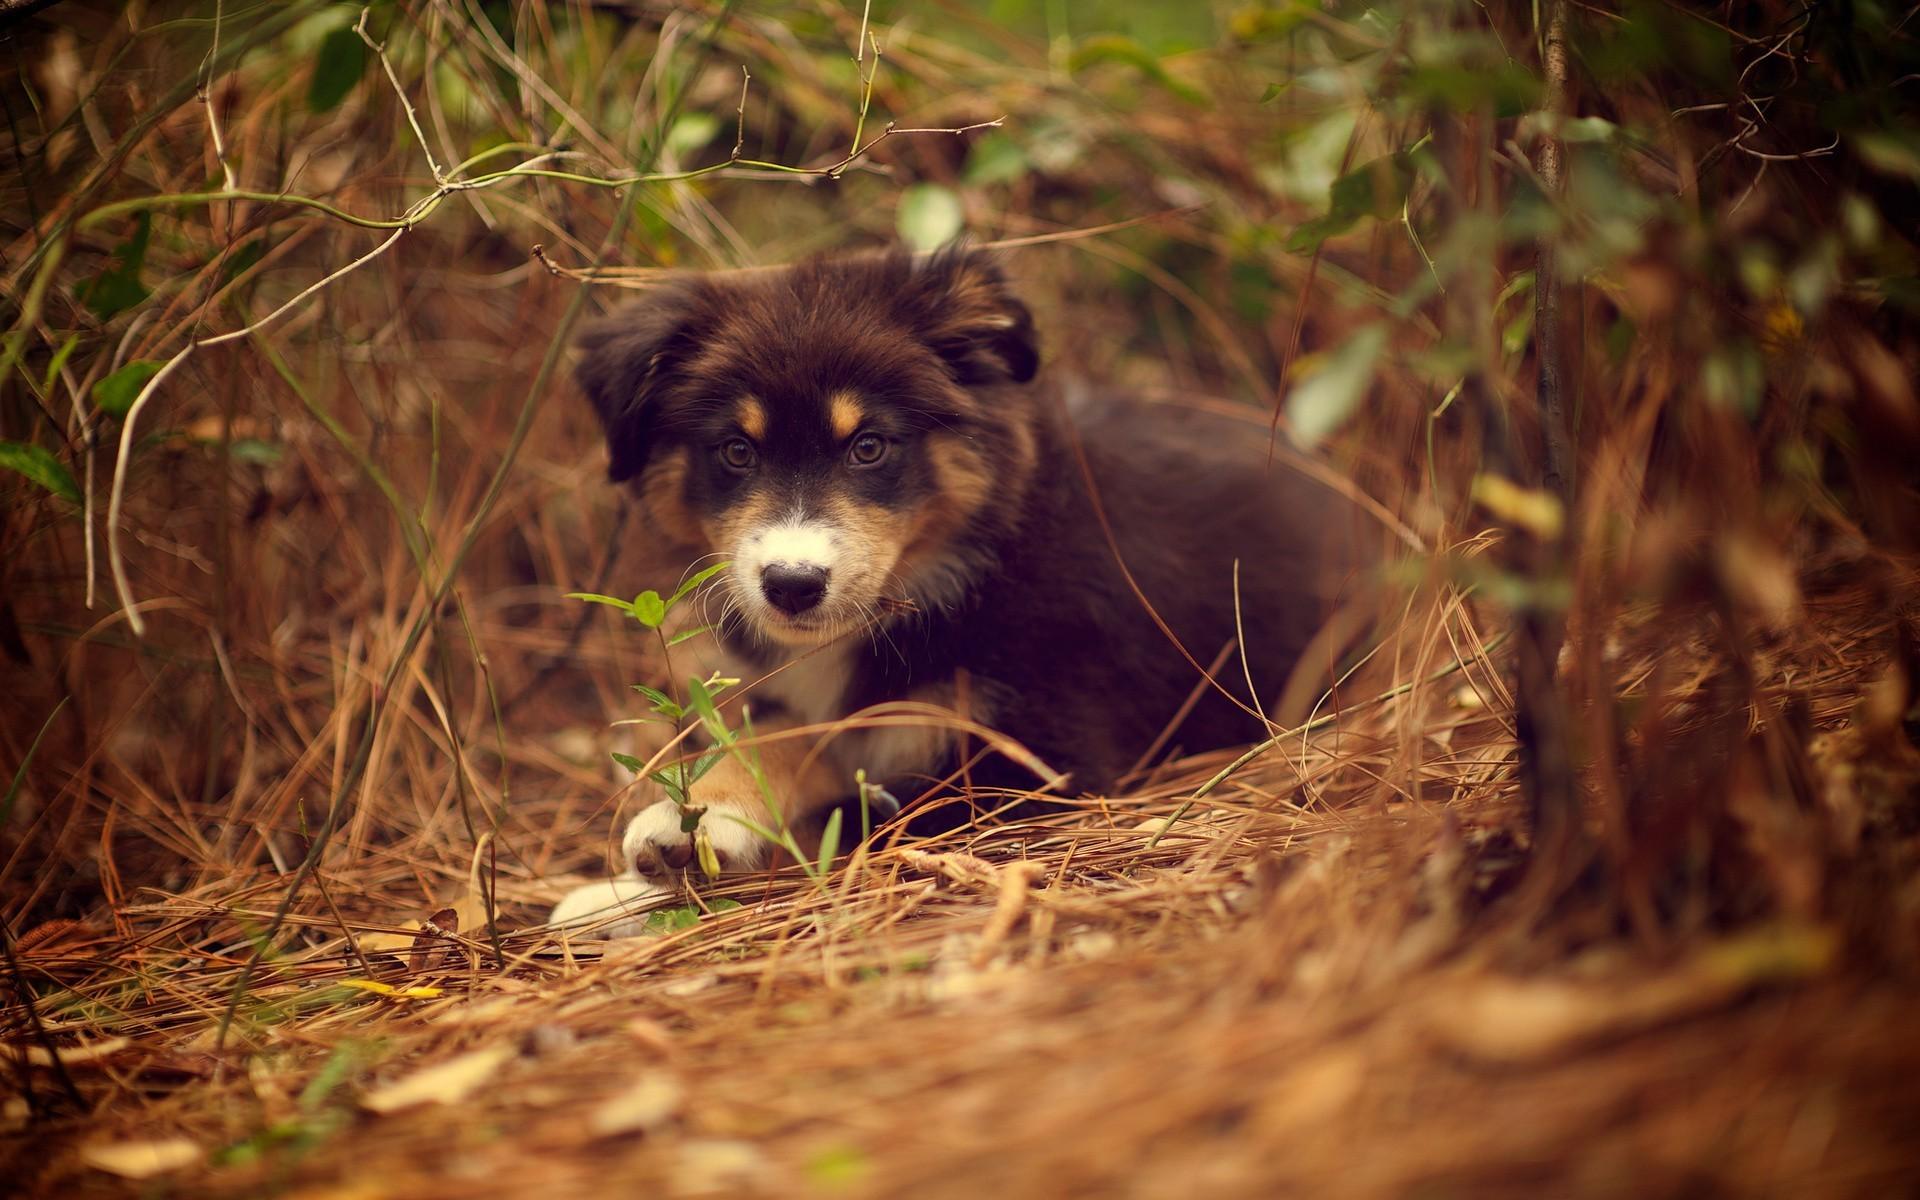 Cute Puppies Full Hd Wallpapers Australian Shepherd Wallpaper 67 Images